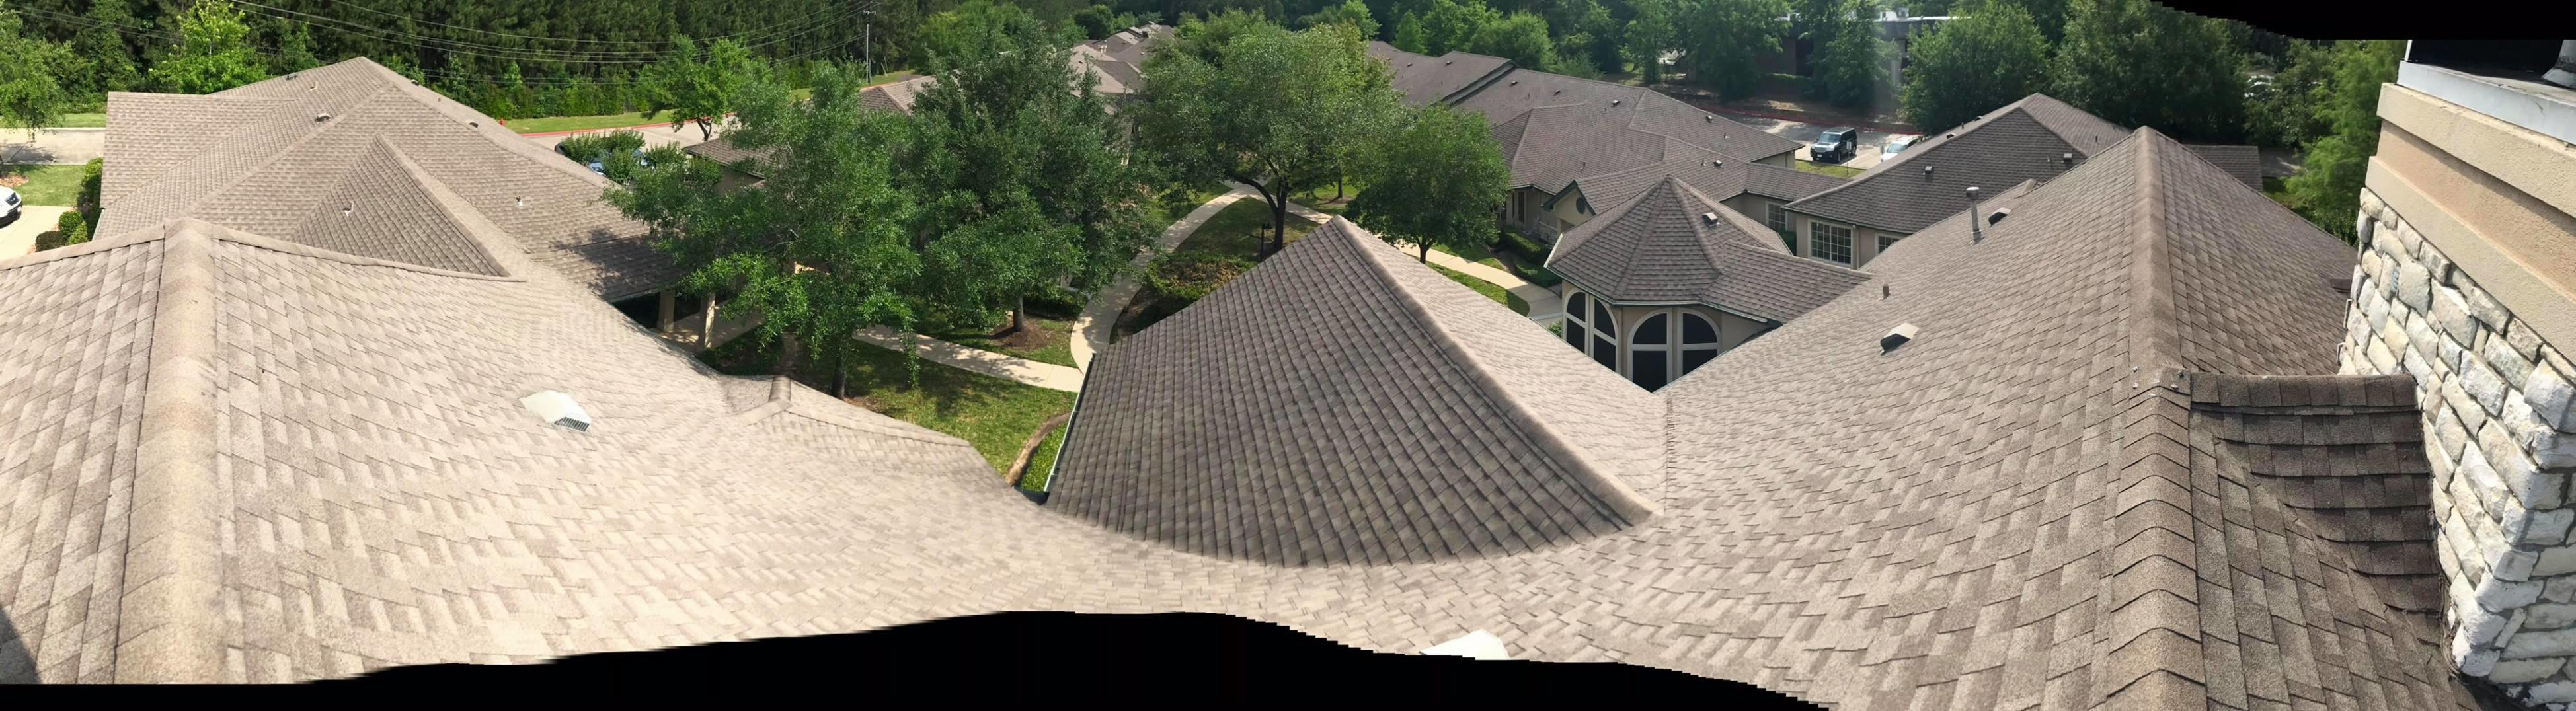 Archstone Roofing & Restoration image 39